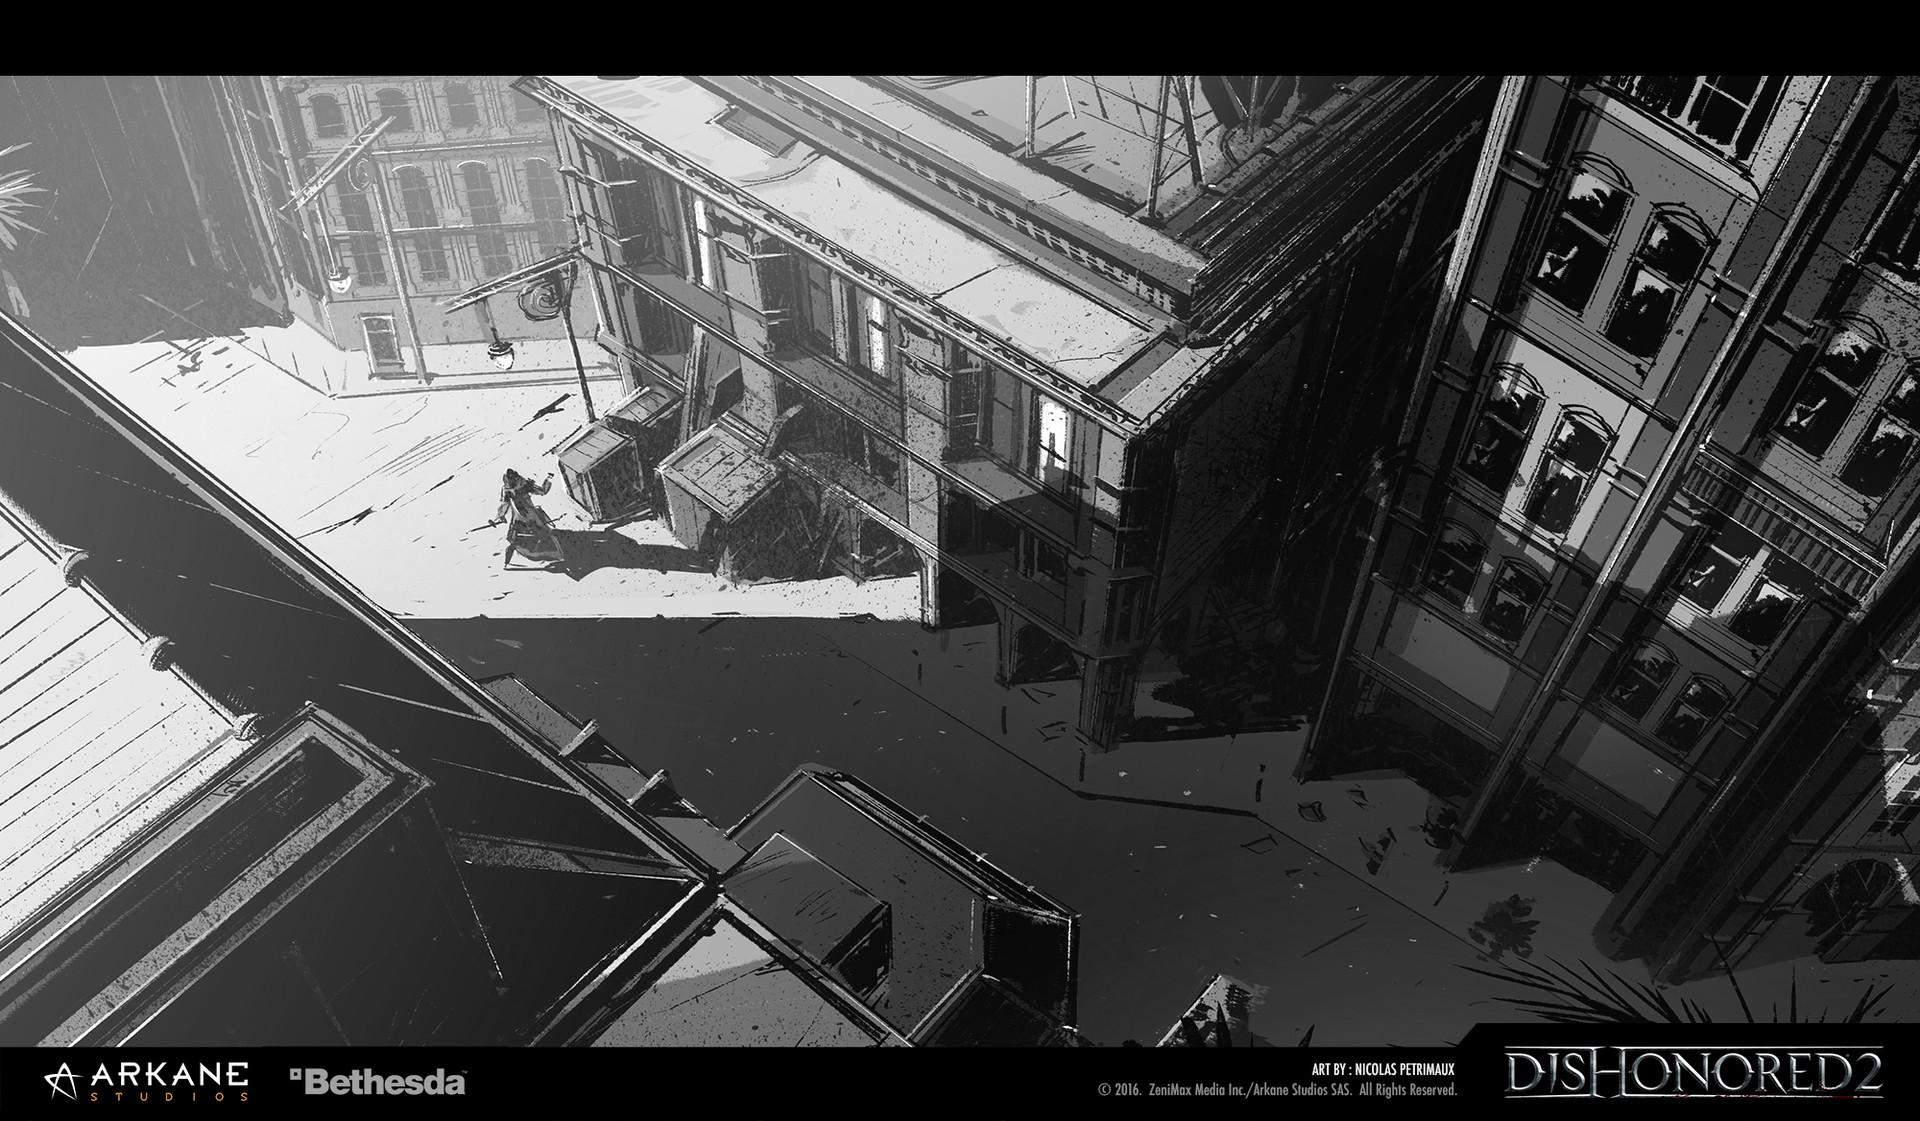 Nicolas petrimaux d2 storybeats s9 28